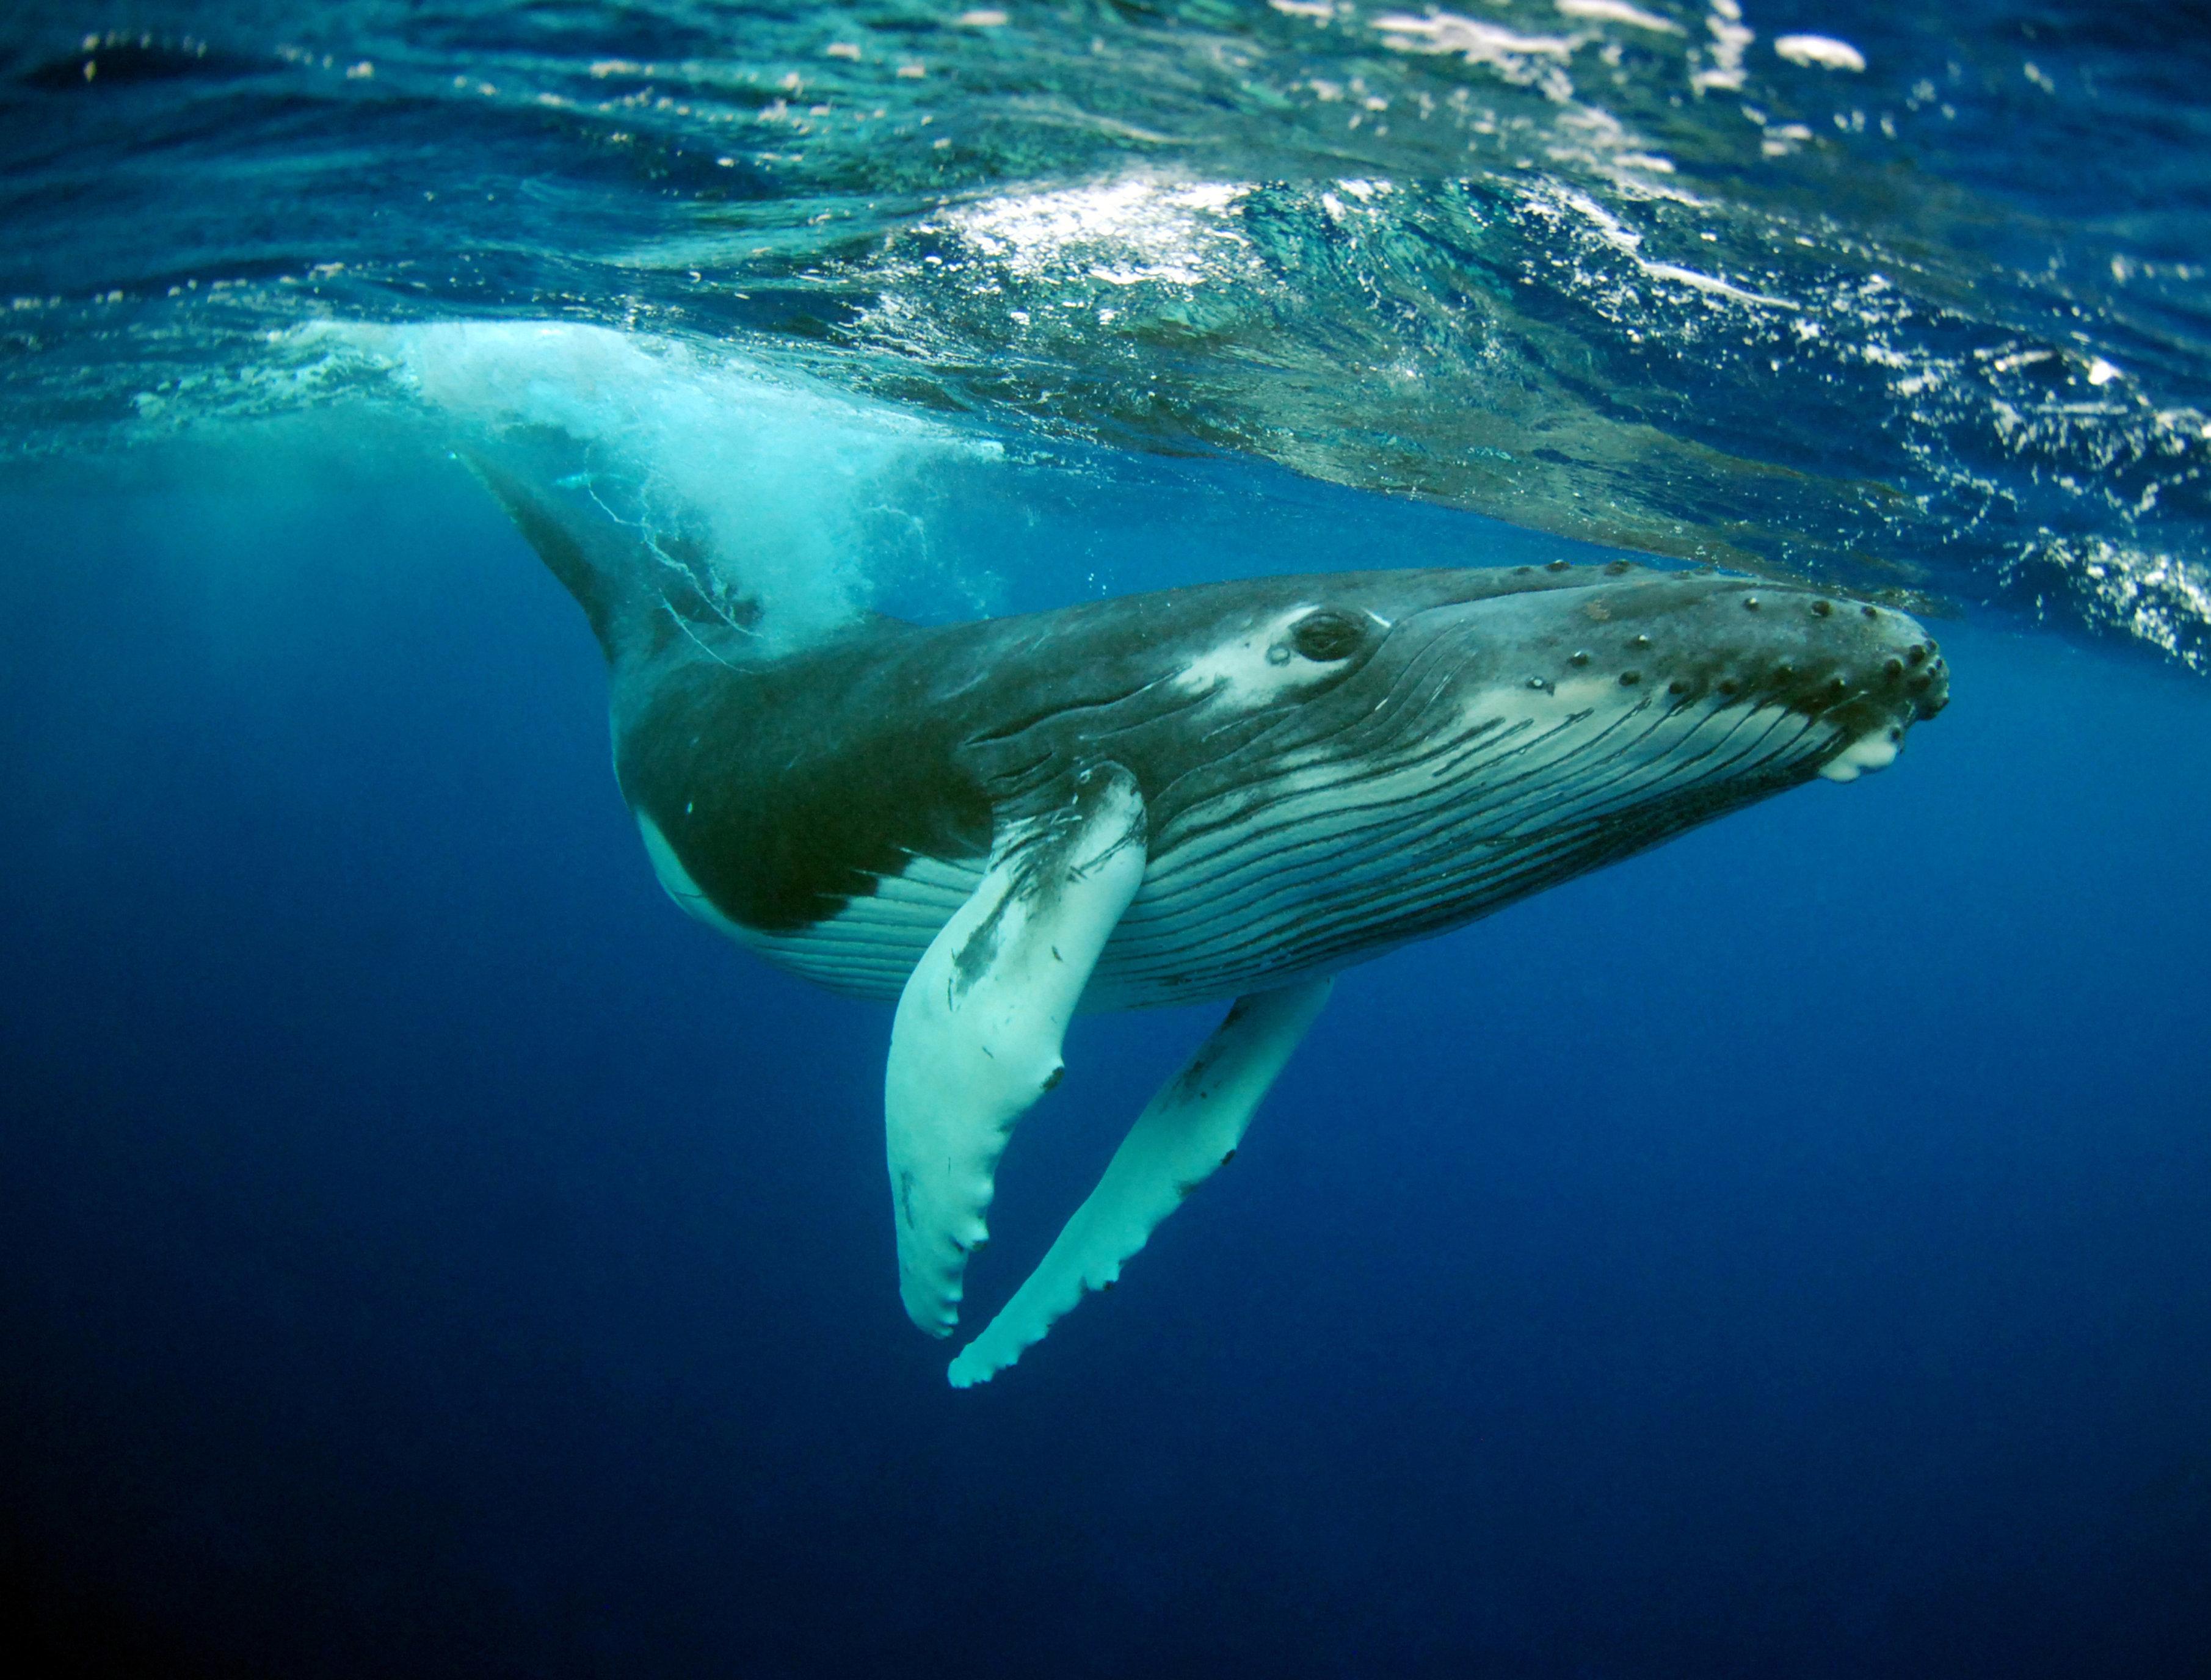 Humpback Whale (Megaptera novaeangliae) calf portrait